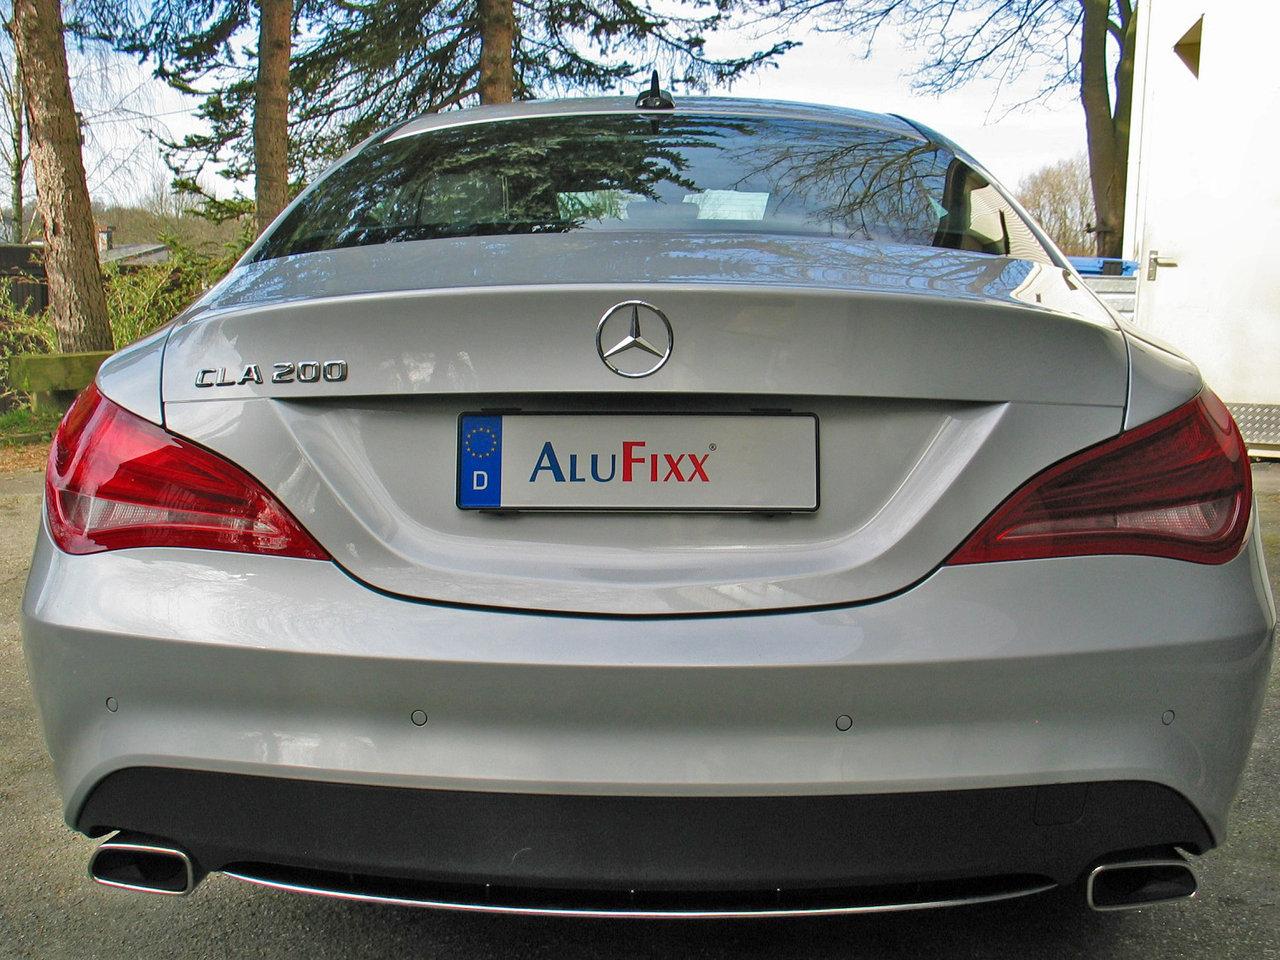 AluFixx Car MB Set schwarz matt eloxiert Nummernschildhalter ...